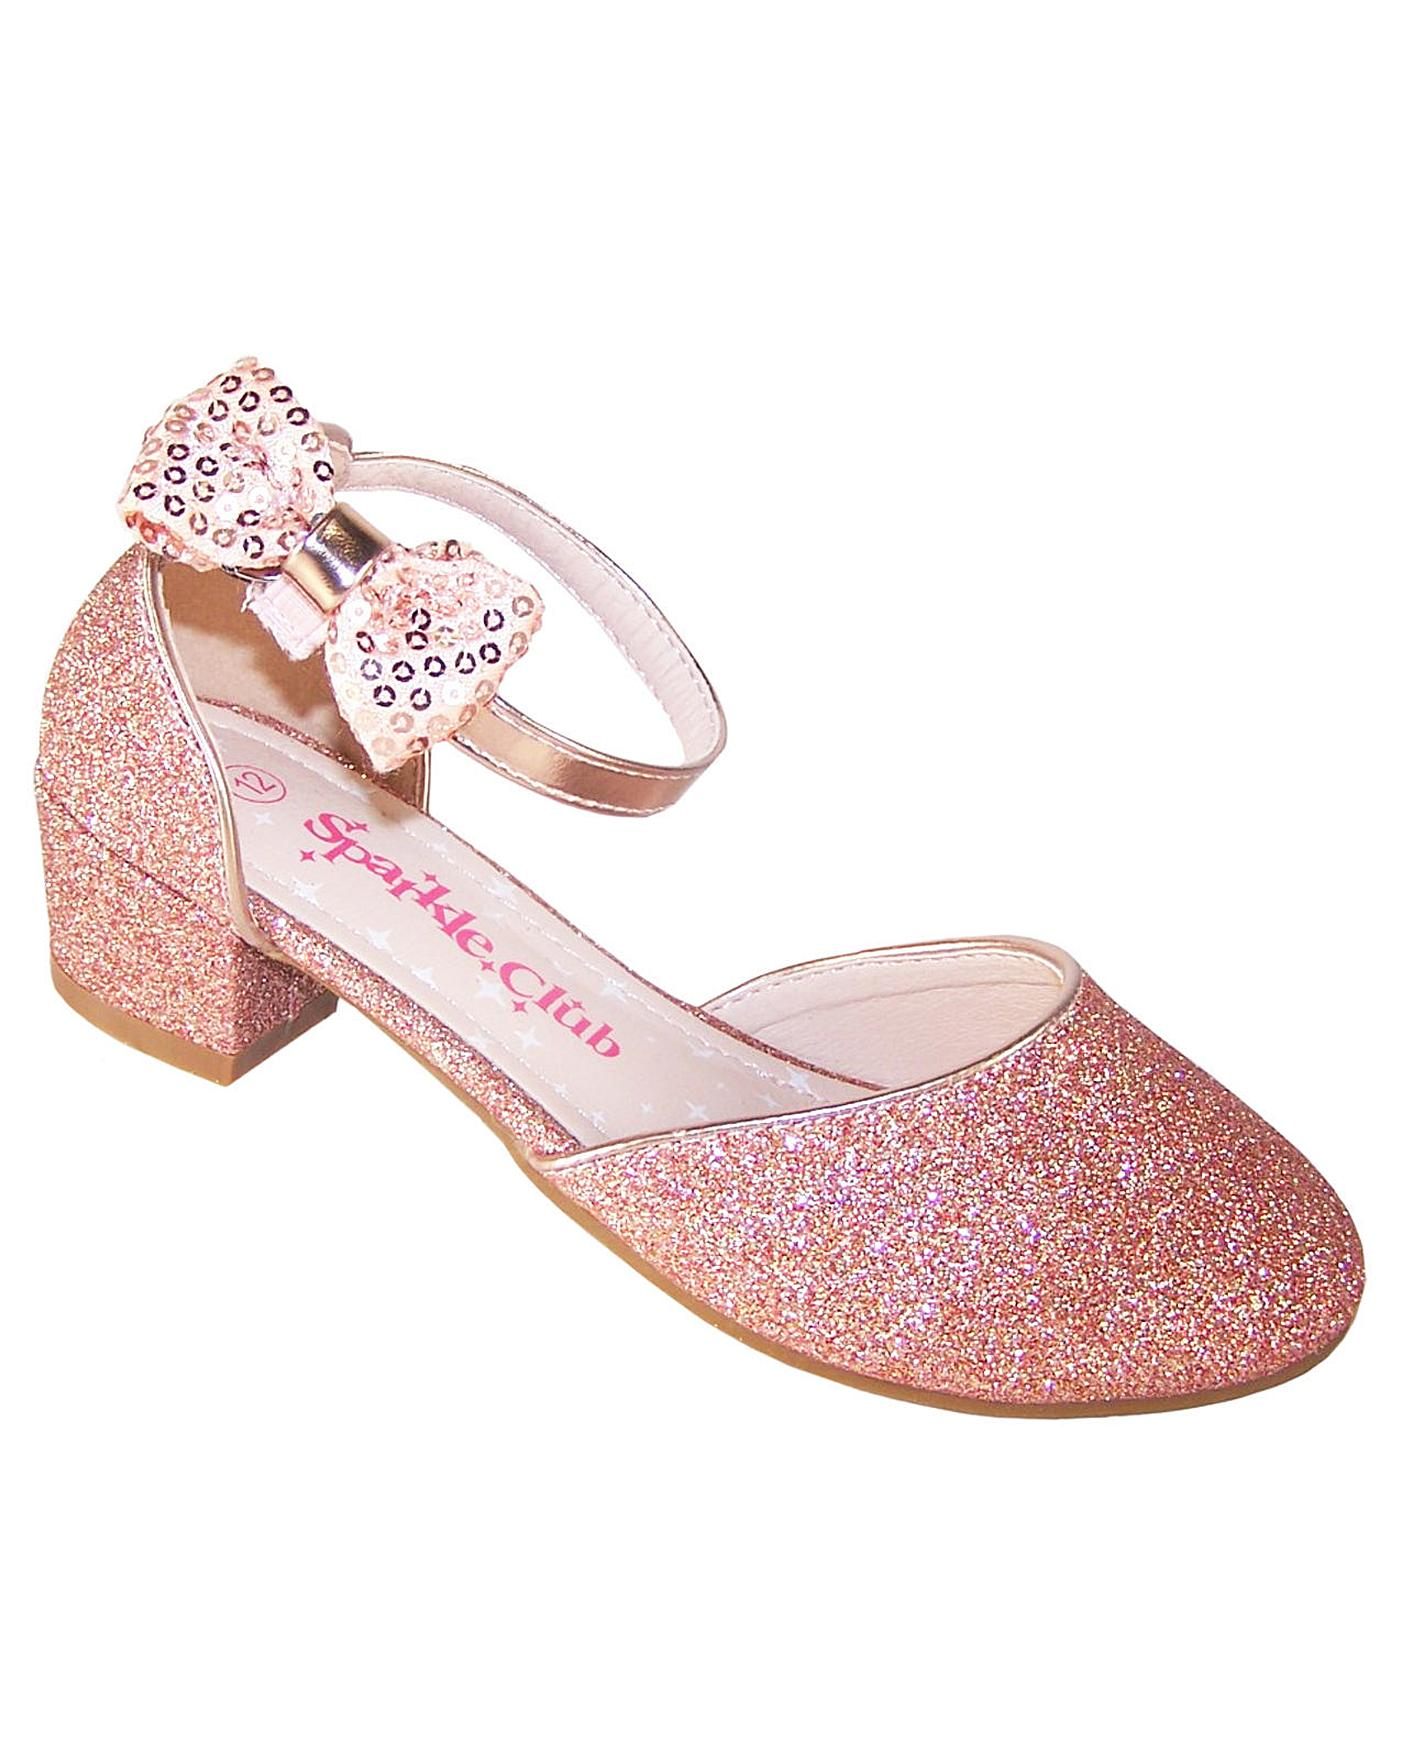 Sparkle Club Rose Gold Shoes | Fashion